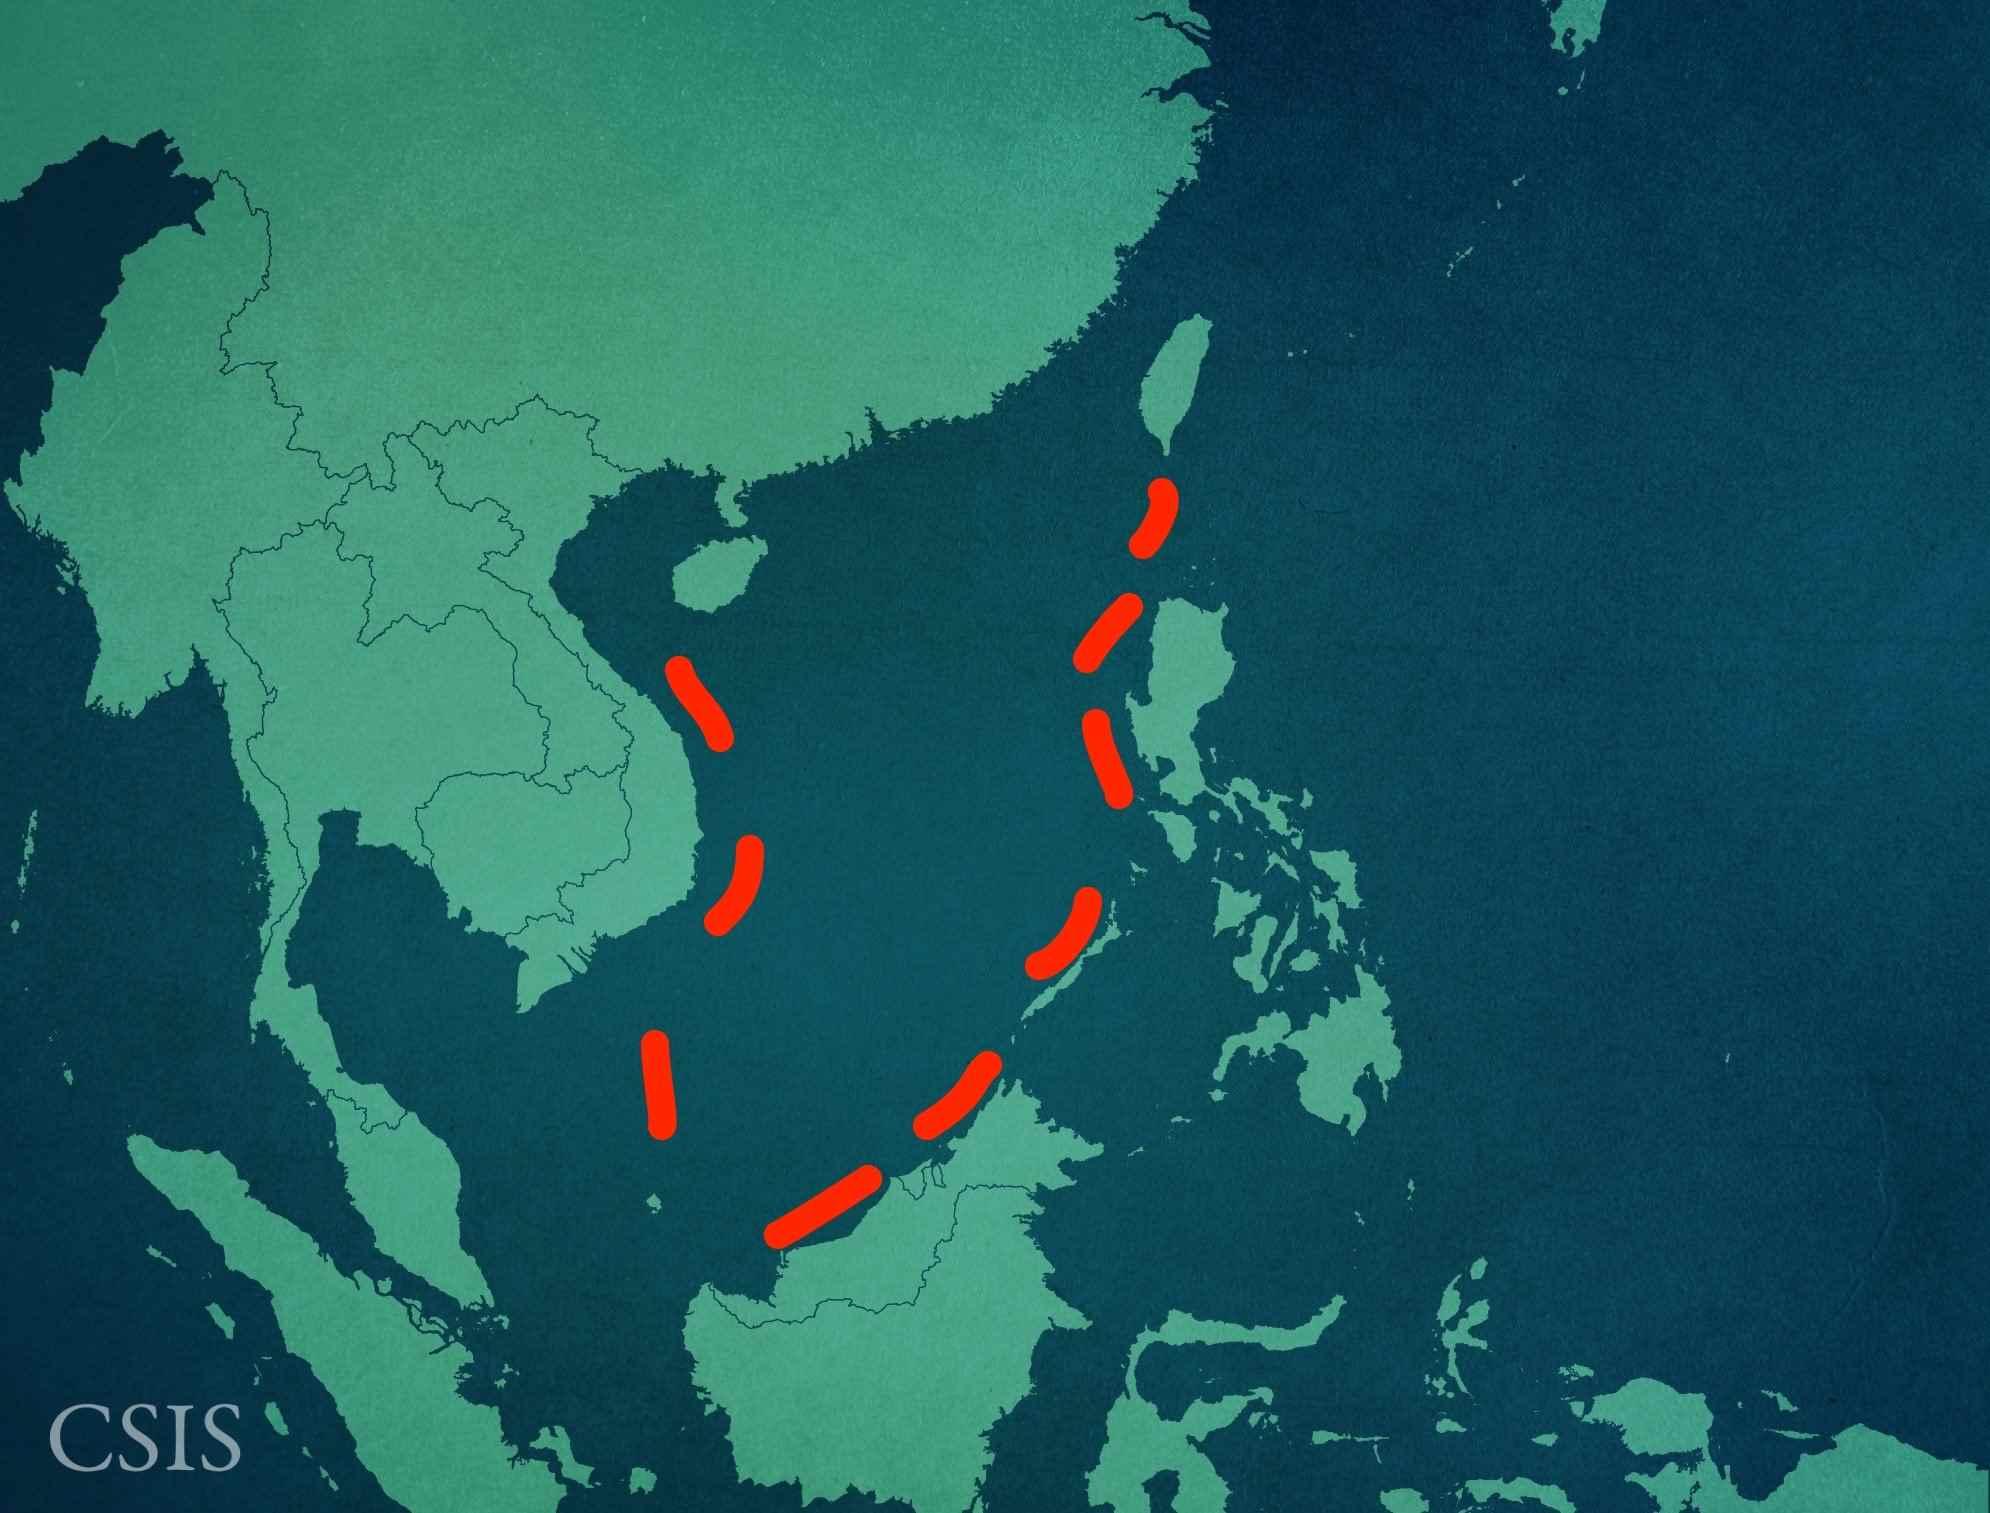 Mar Cinese Meridionale: Filippine vincono causa con la Cina